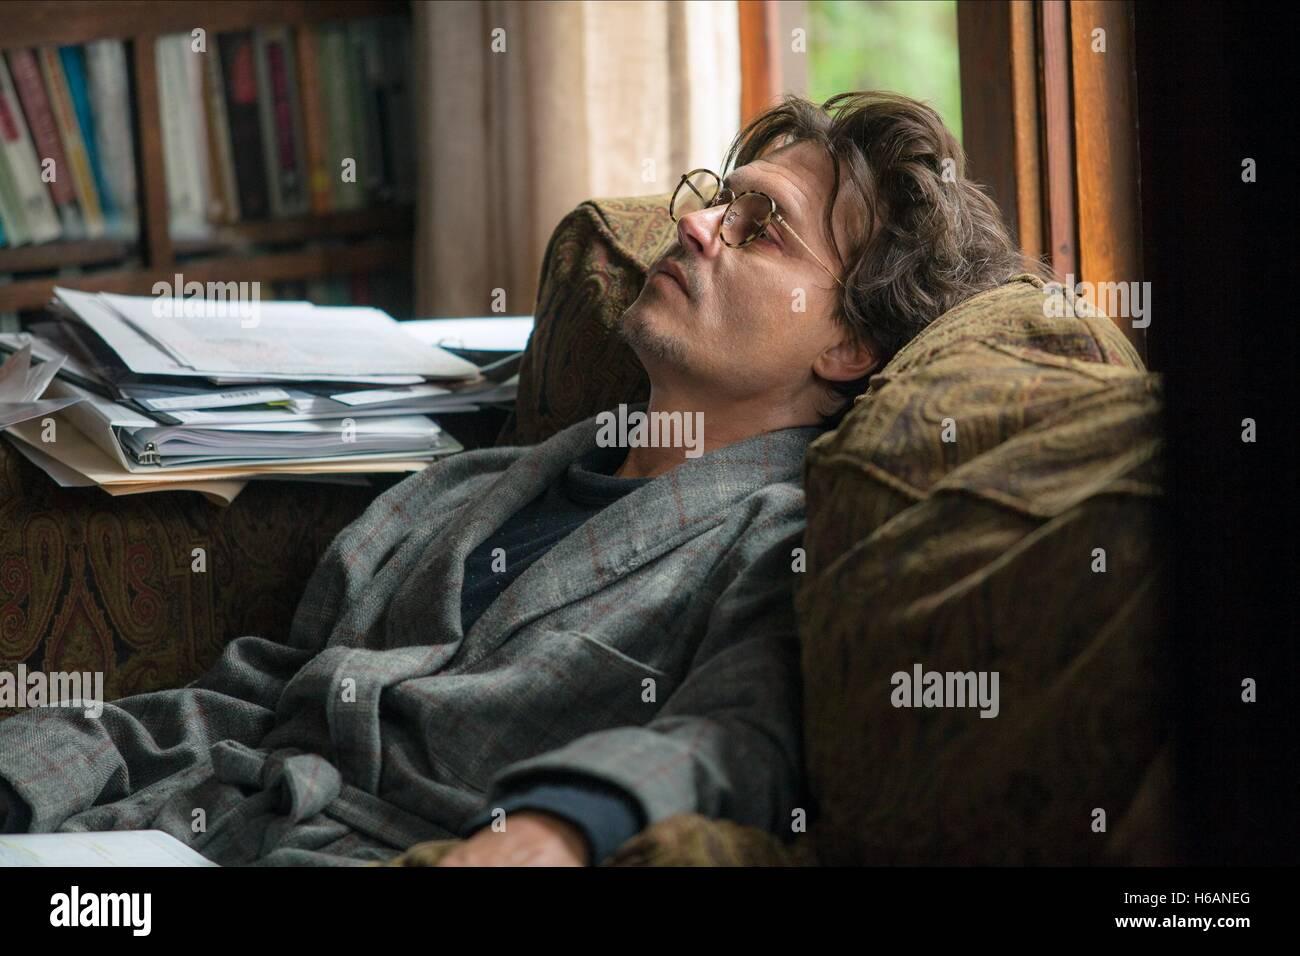 JOHNNY DEPP TRANSCENDENCE (2014) - Stock Image